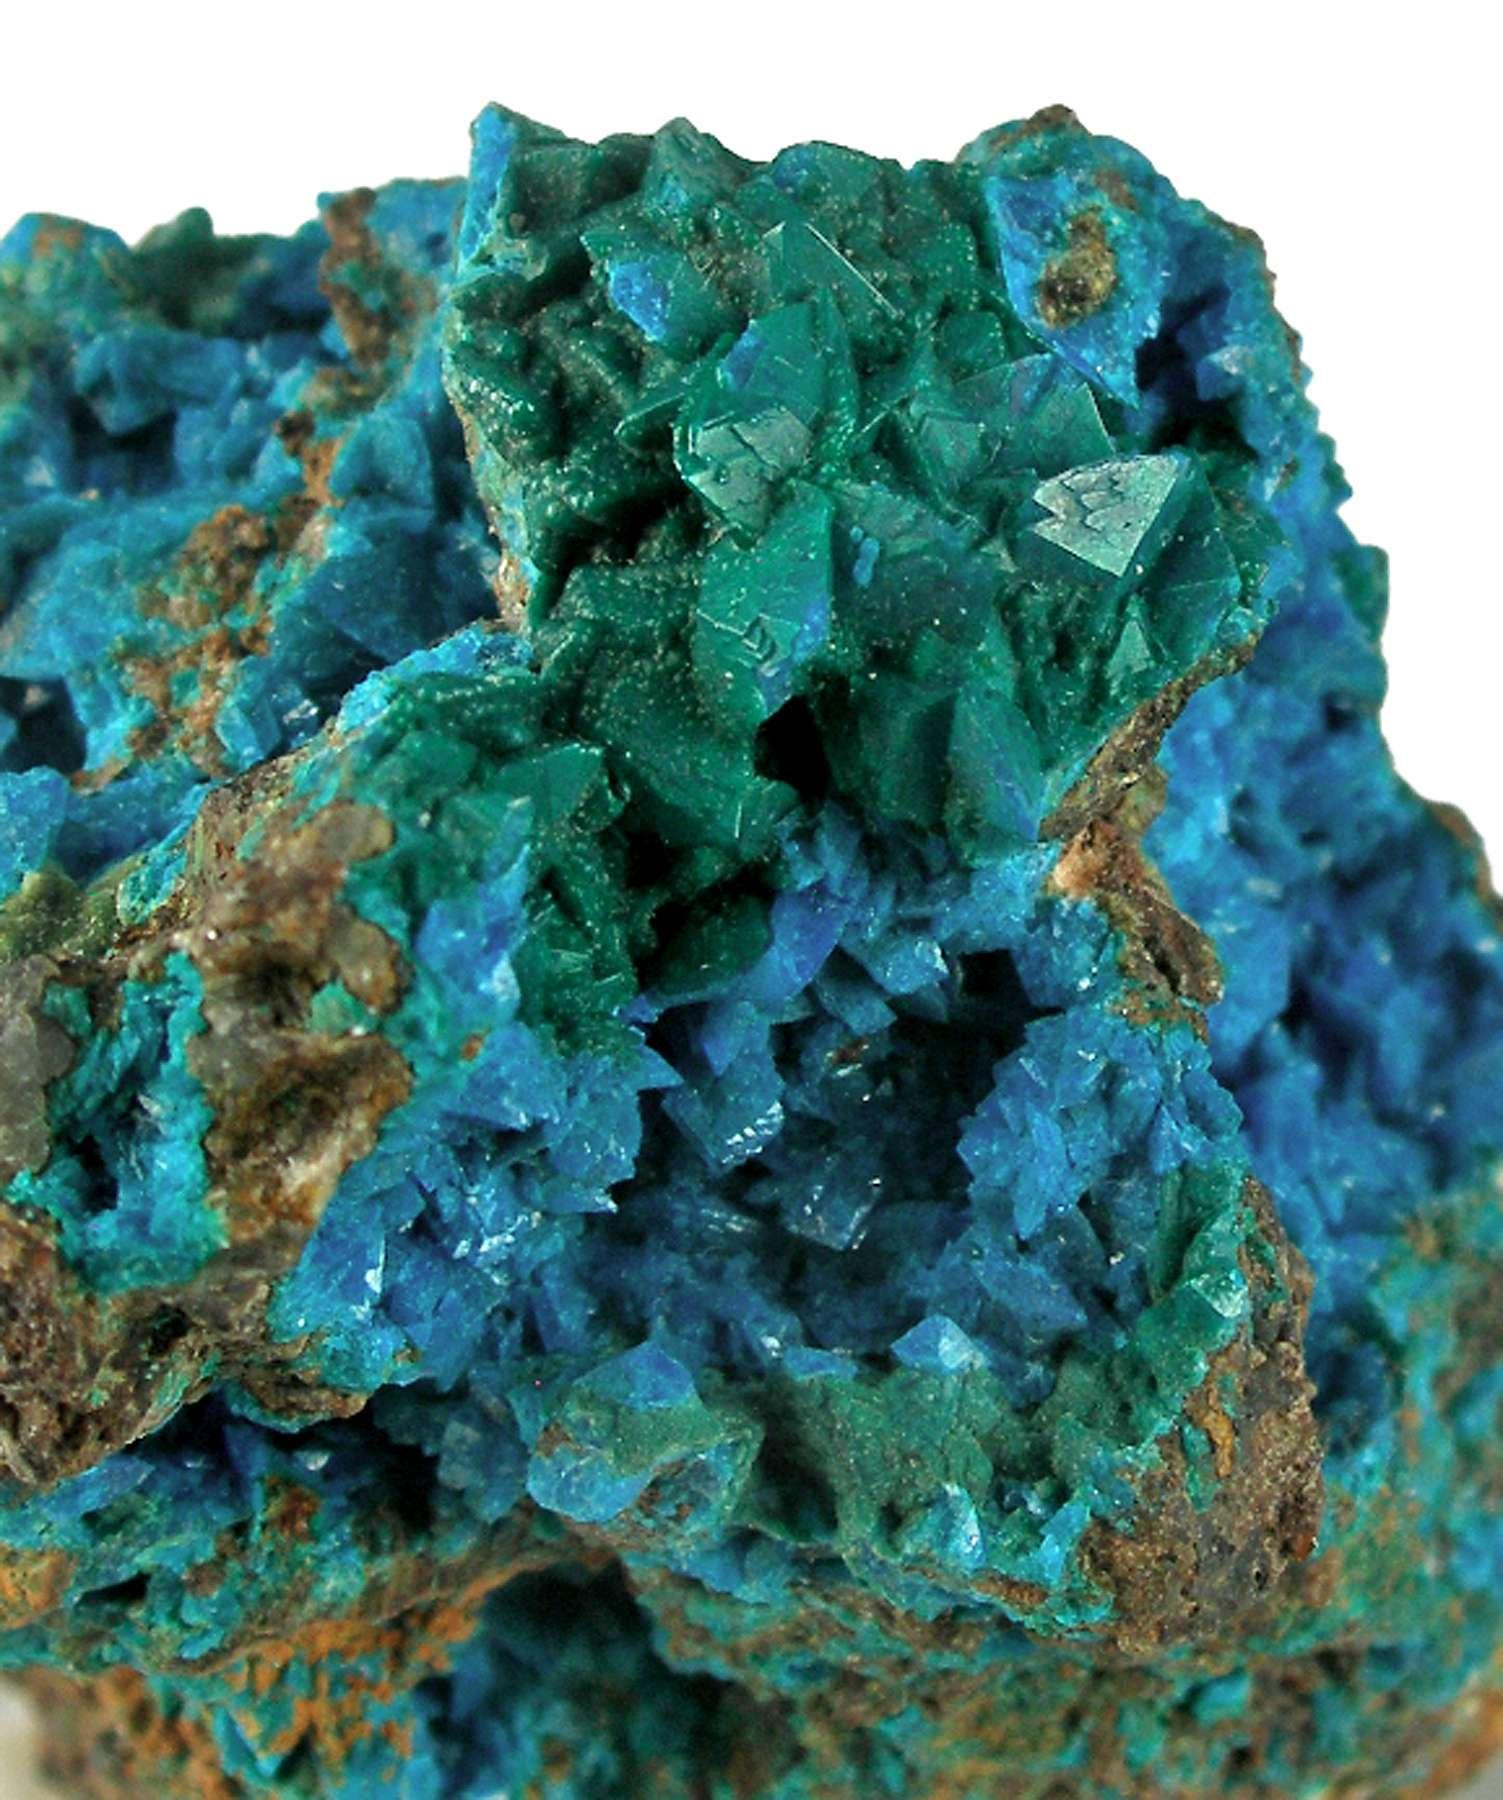 Liroconite rare copper species upper oxidized zones just deposits